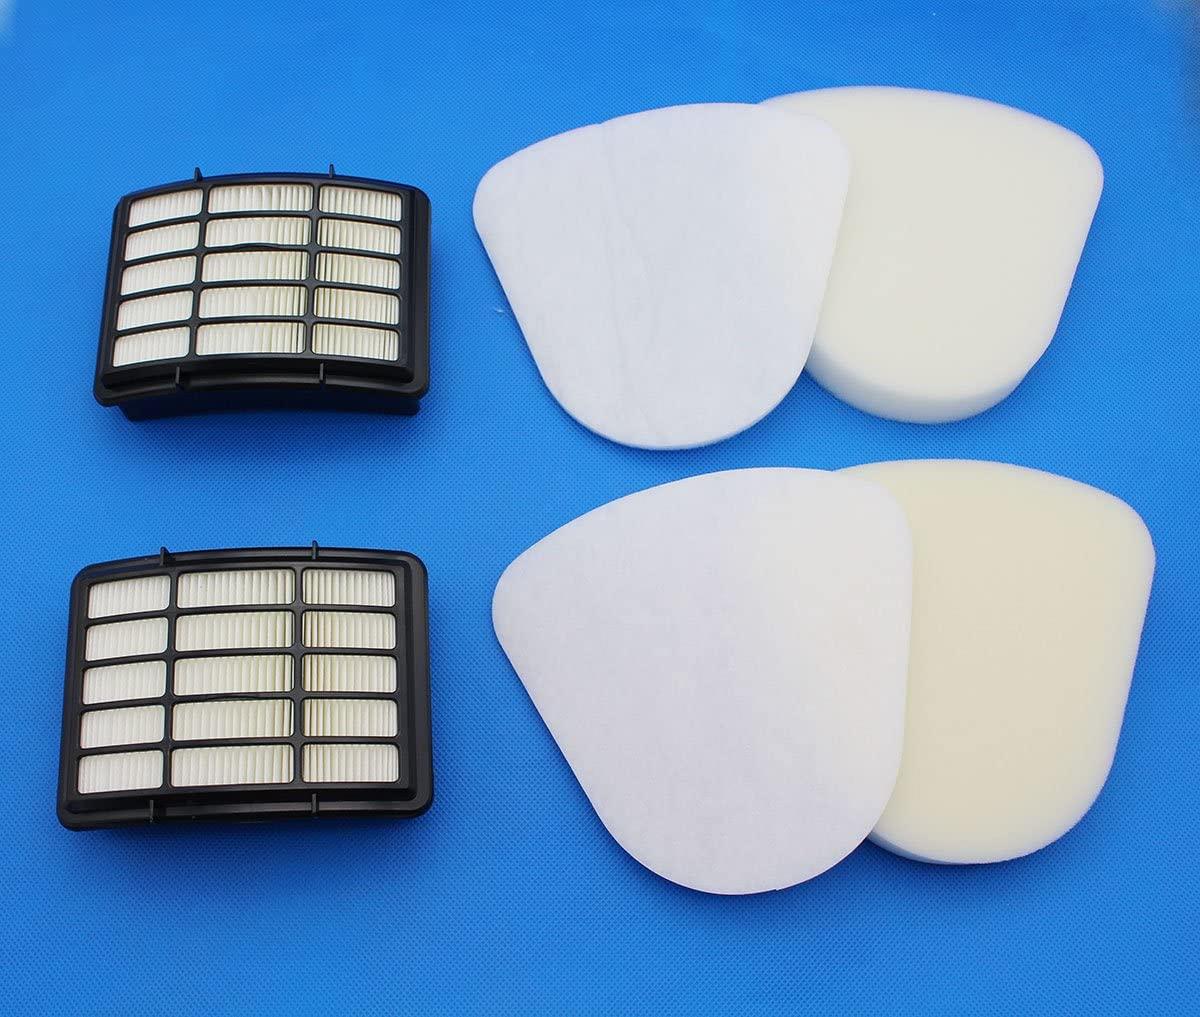 Raogoodcx Shark Navigator Lift Away Filter Nv350 Xff350 Xhf350 Sets, Fits Nv351, Nv352, Nv355, Nv356, Nv357, 2 Pre-Filter Foam & Felt and 2 Hepa Filter